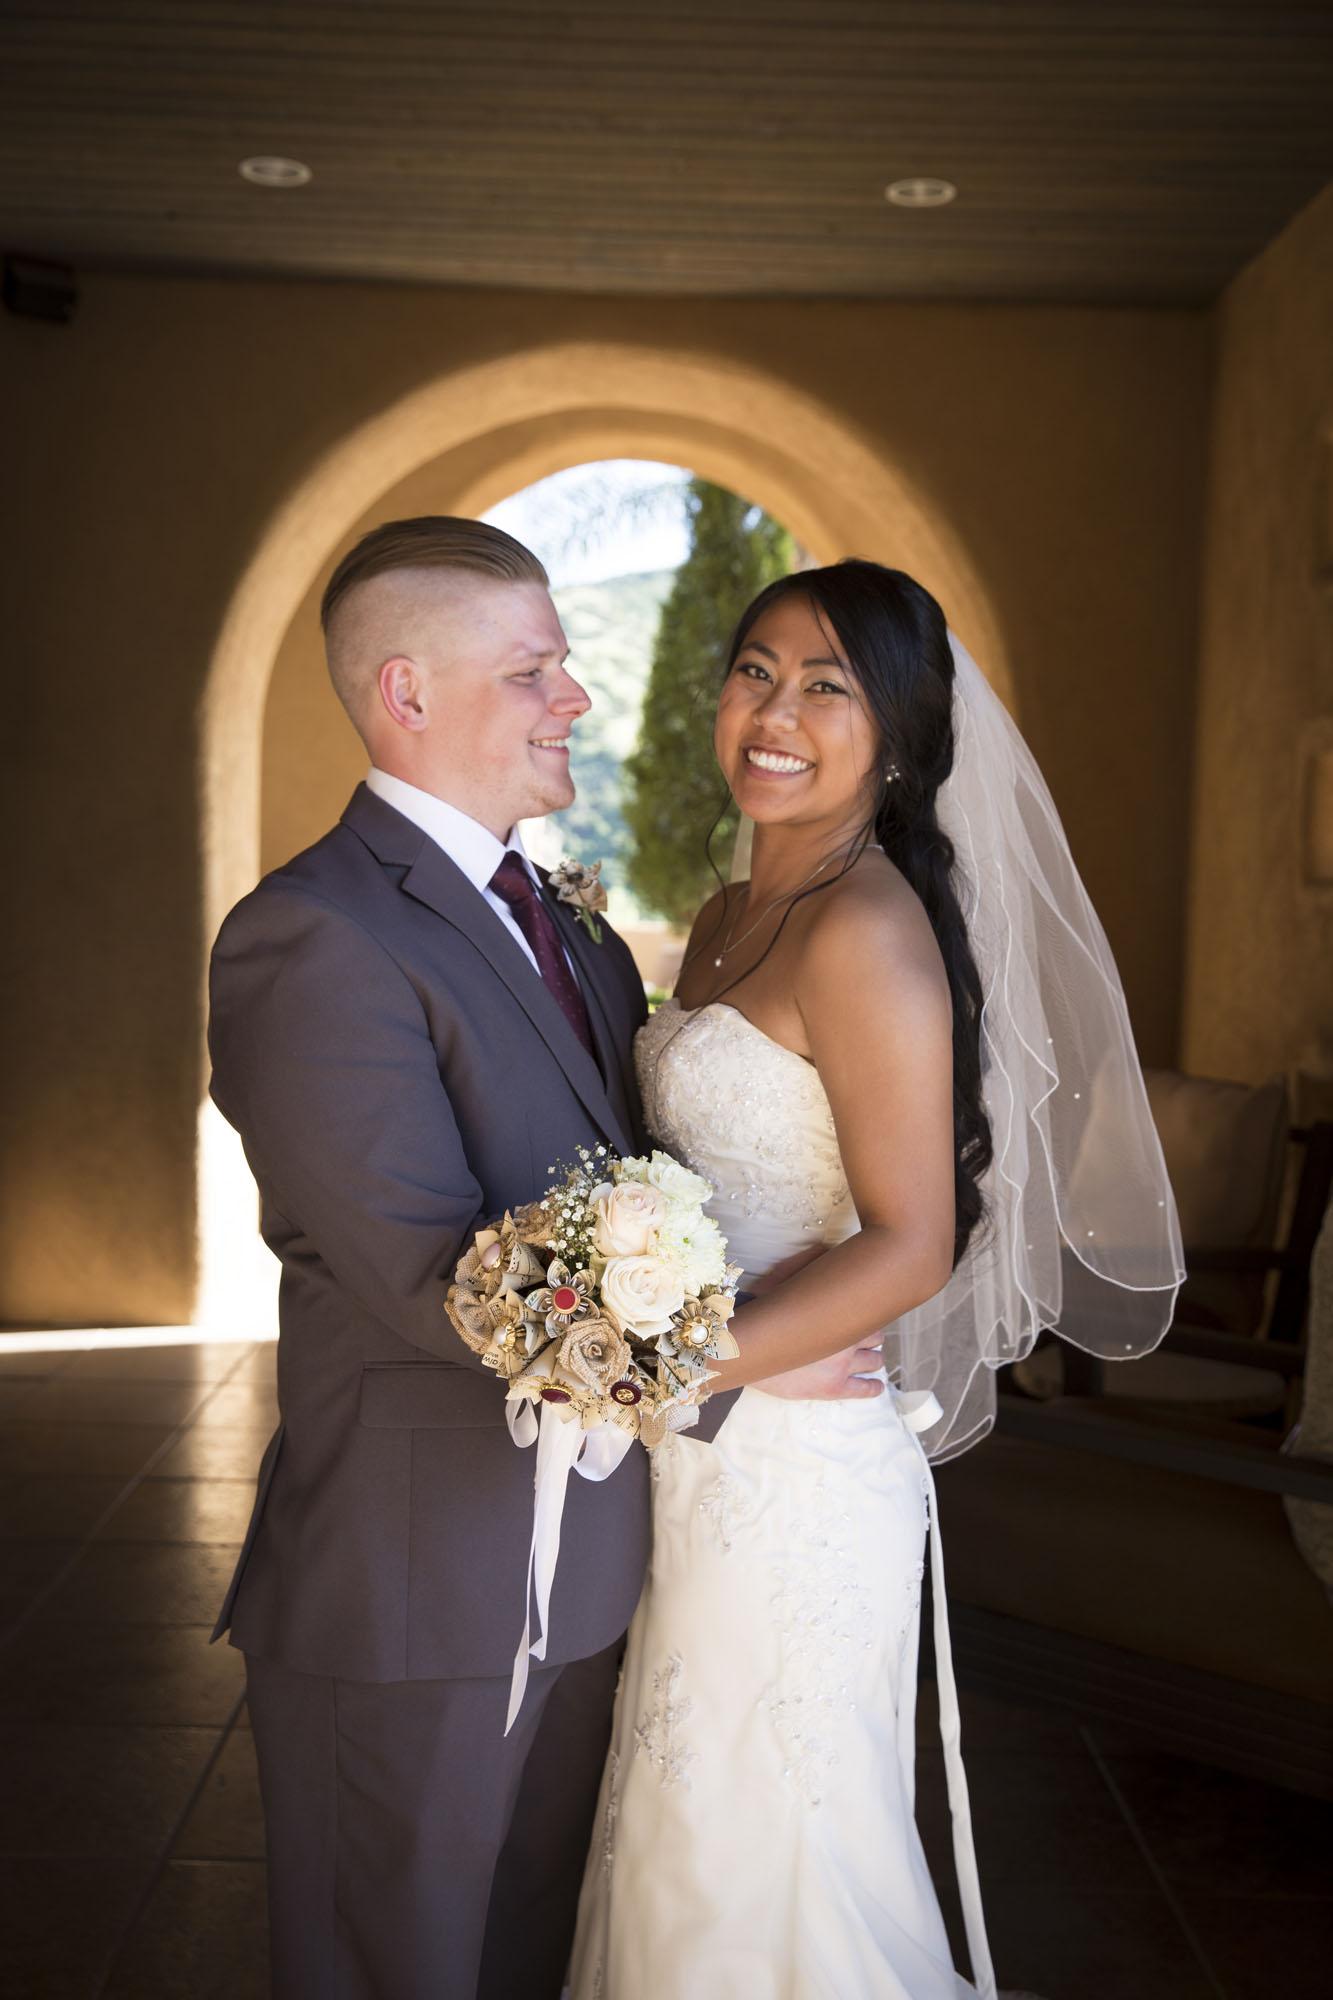 Archway classic wedding pose